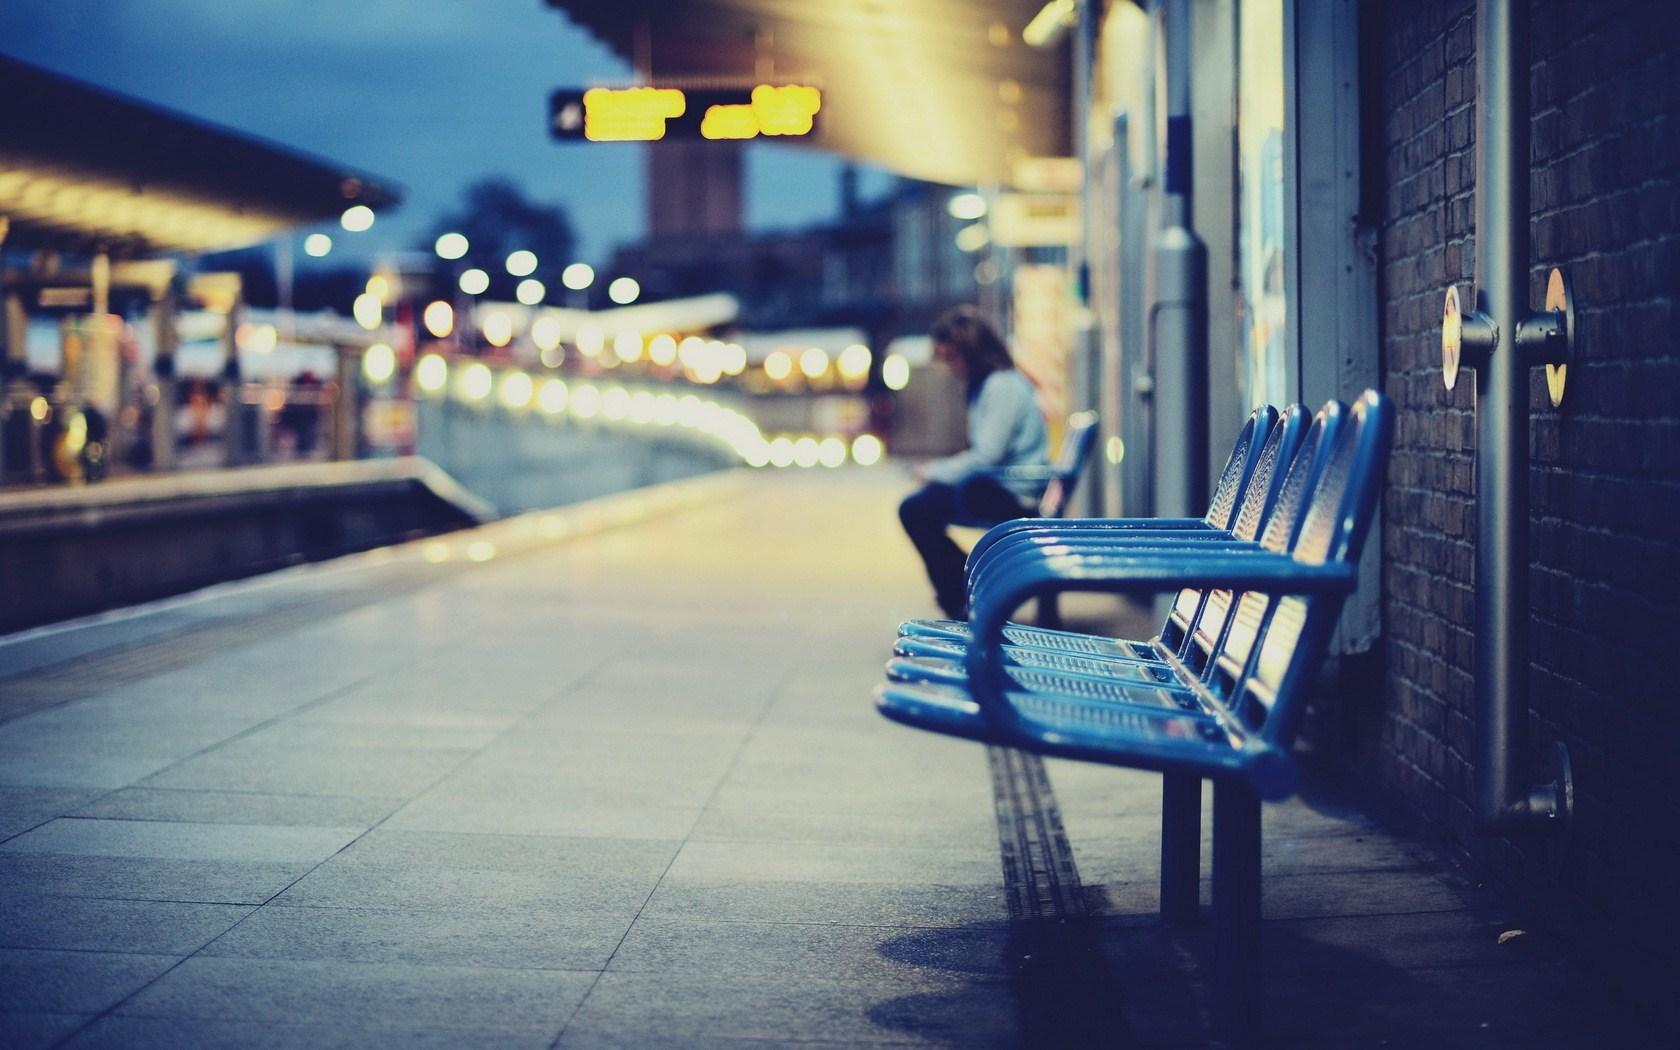 City Railway Station Chairs Blur Photo